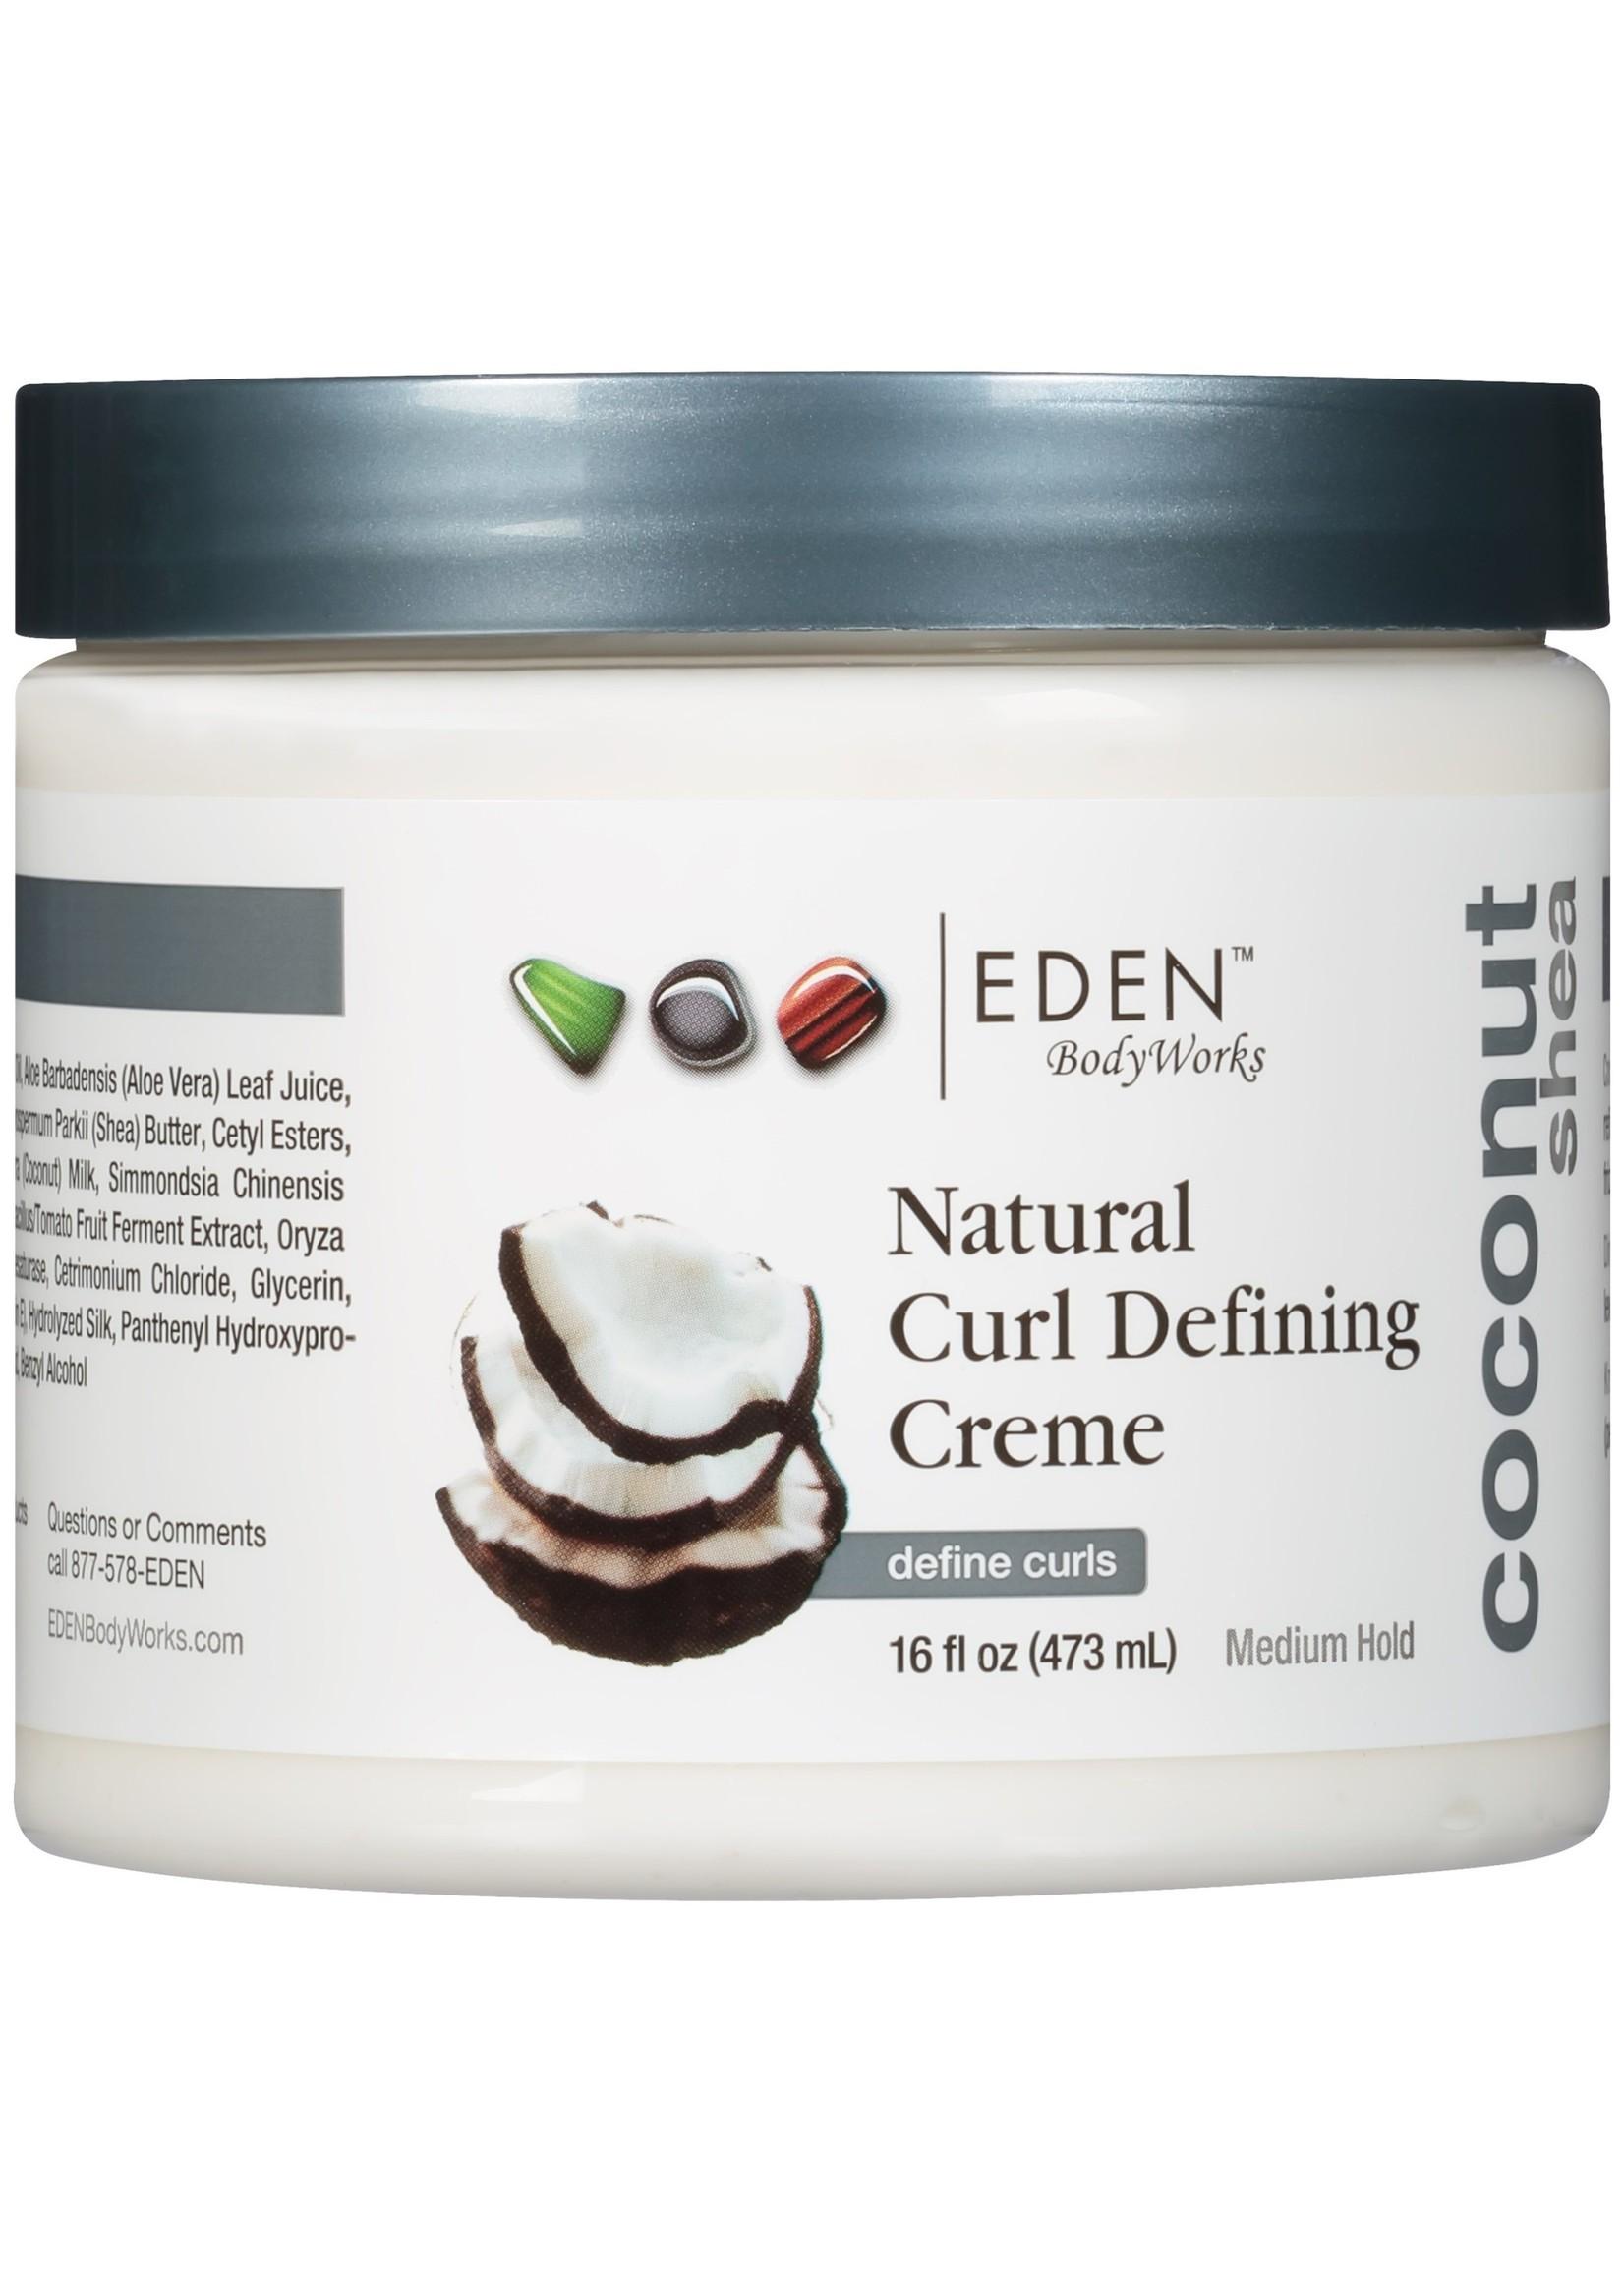 Eden Natural Curl Defining Creme